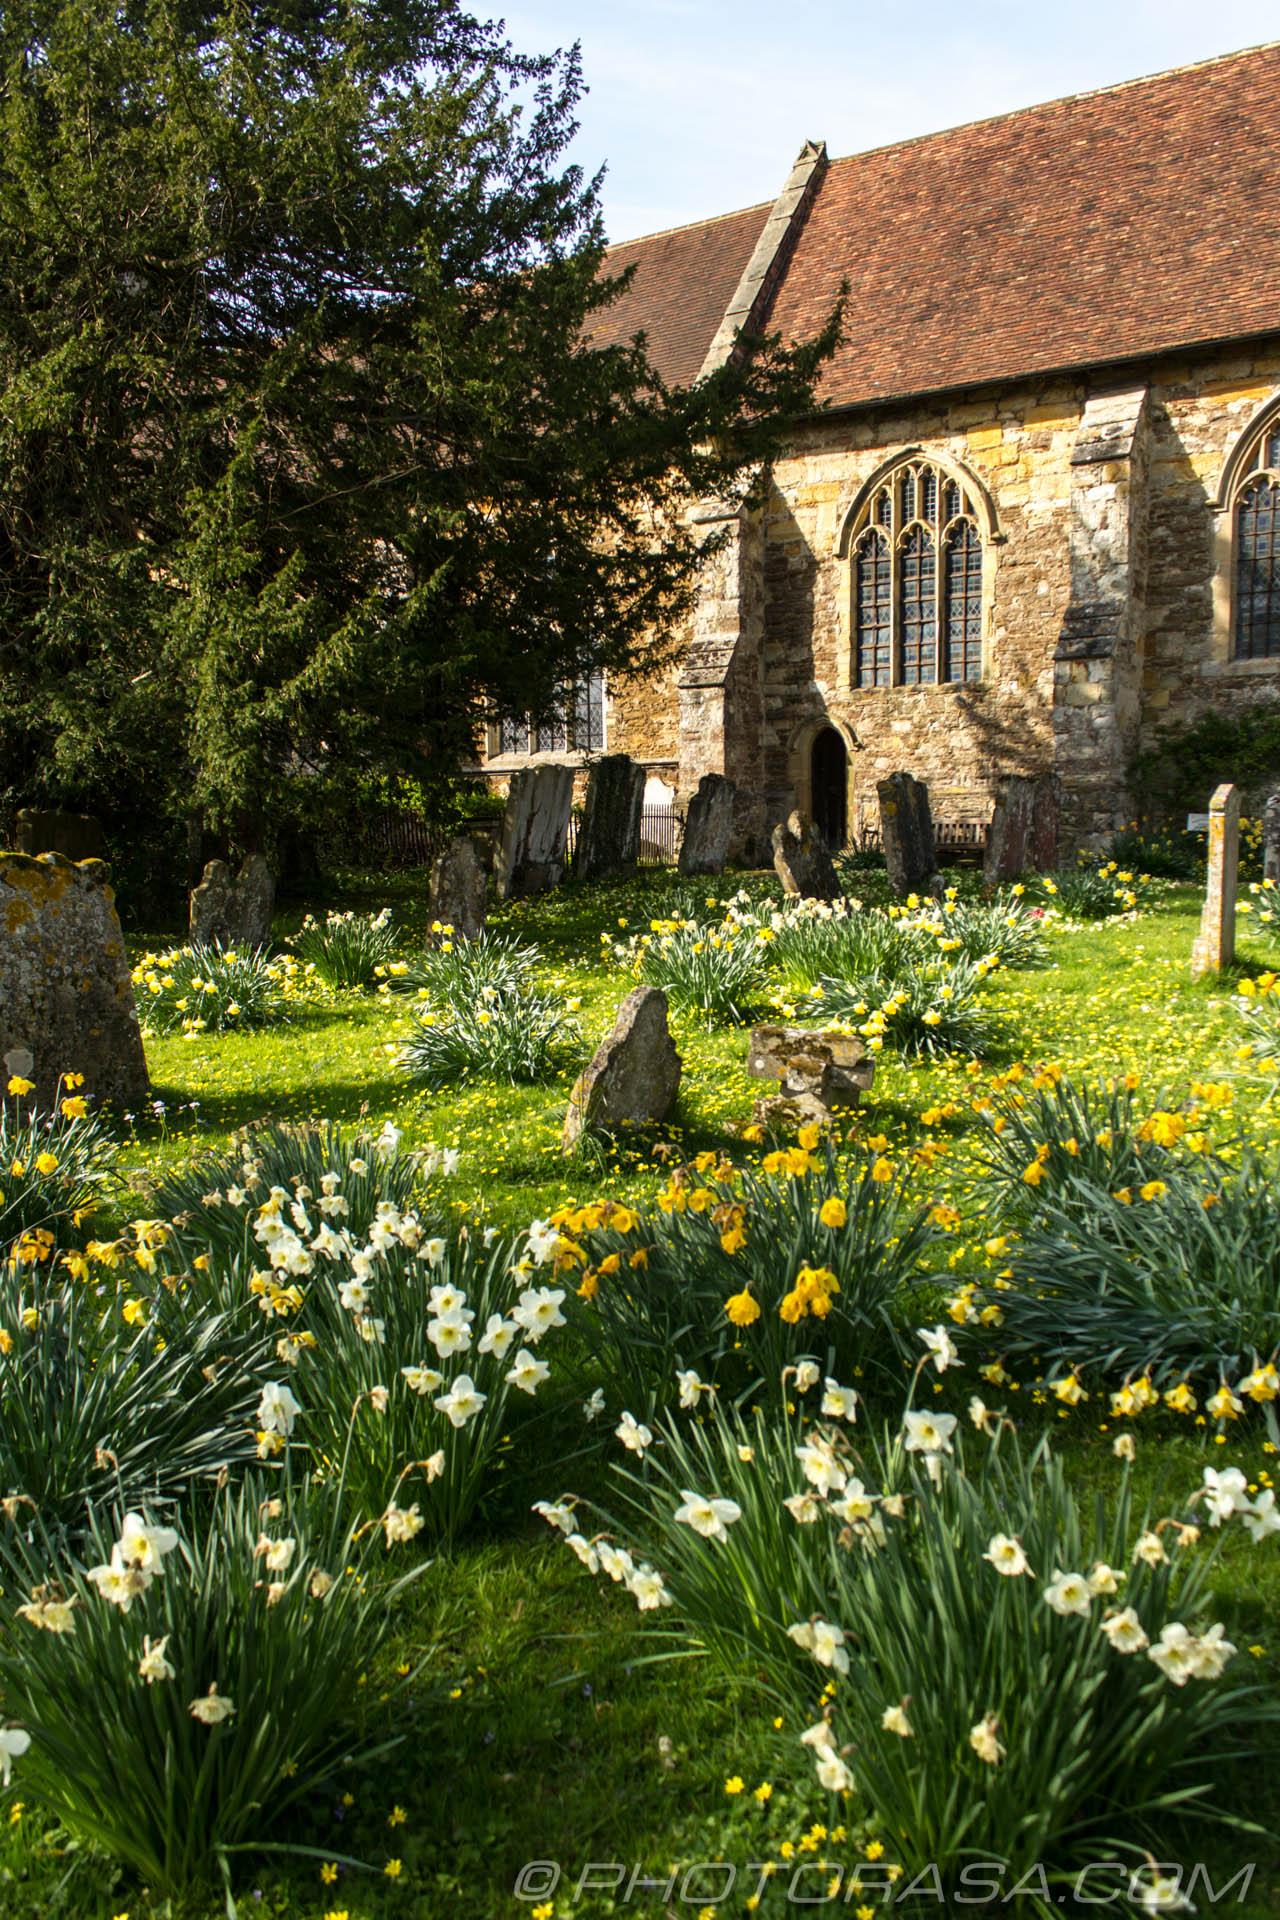 https://photorasa.com/saints-church-staplehurst-kent/daffodils-at-the-side-of-the-church/